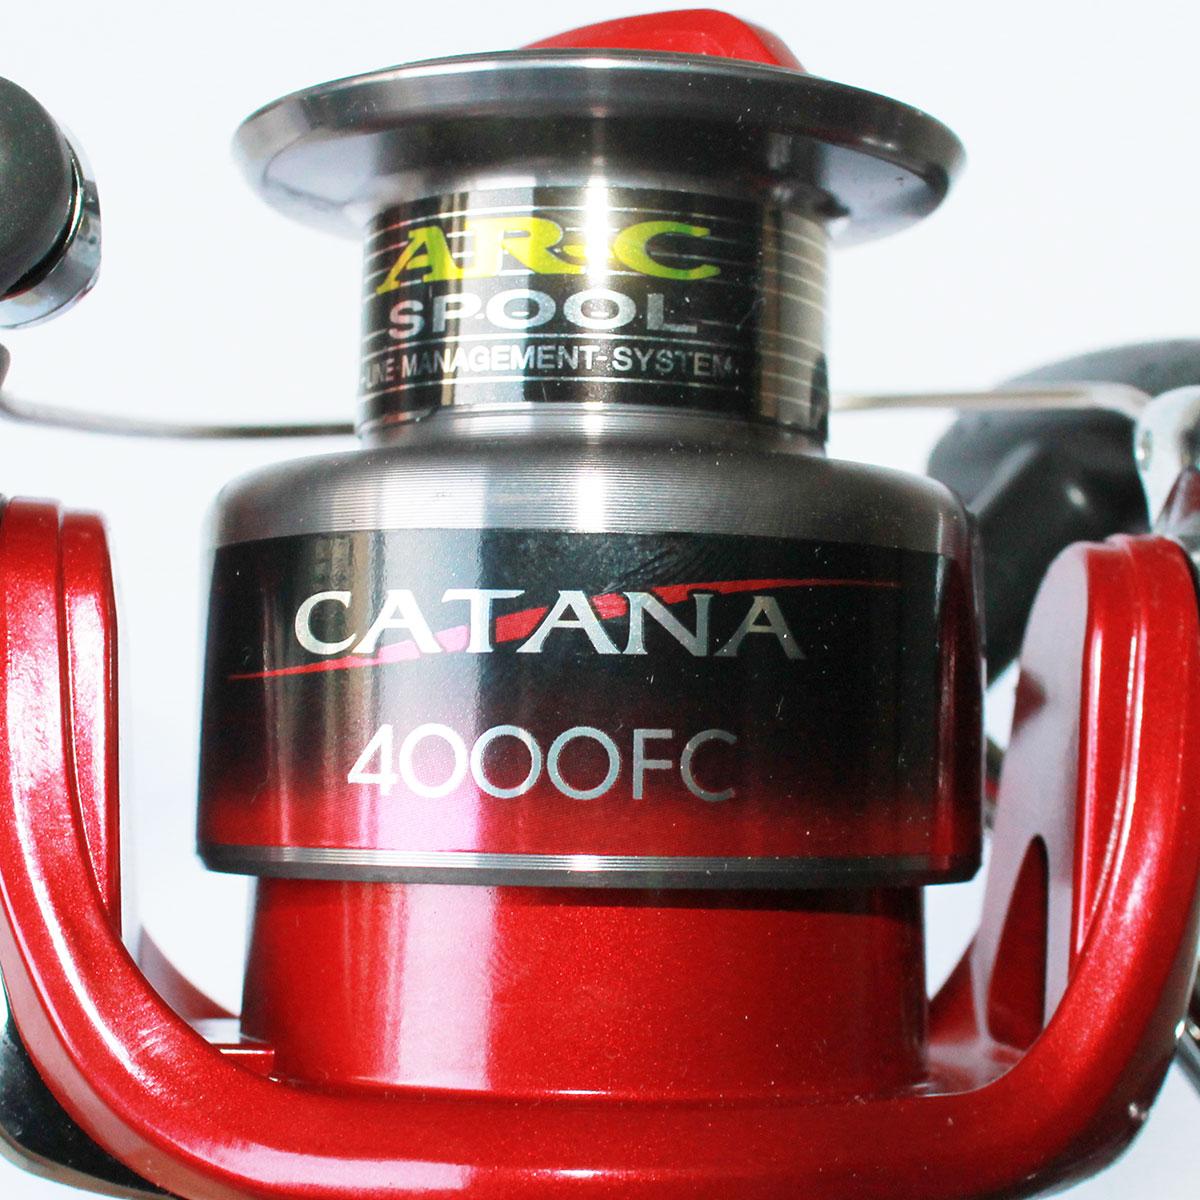 Tính năng máy câu cá Shimano Catana CAT4000 FC